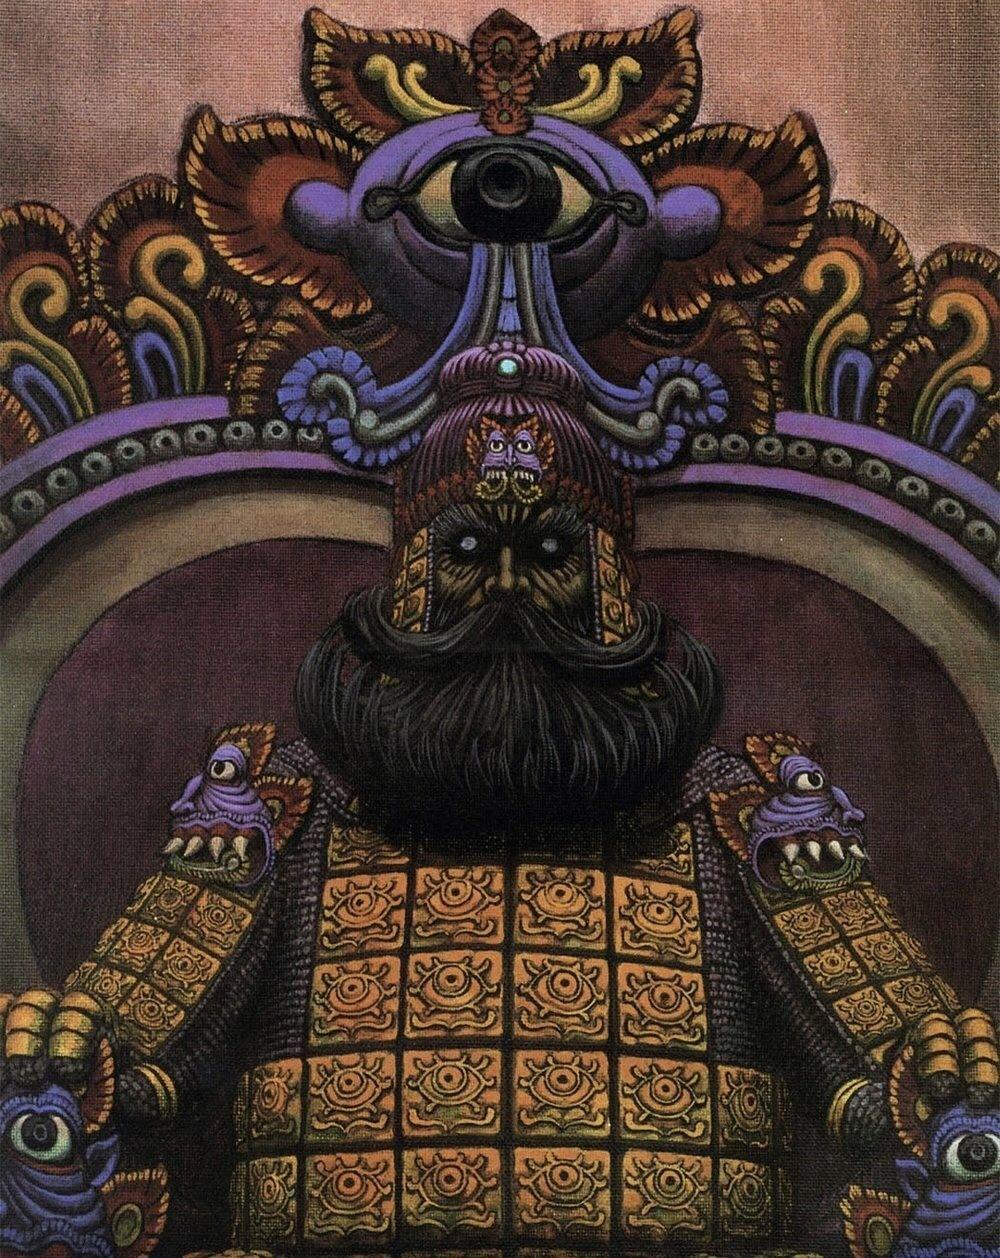 Épinglé par Shiroyasha sur Berserk Illustrations, Empereur